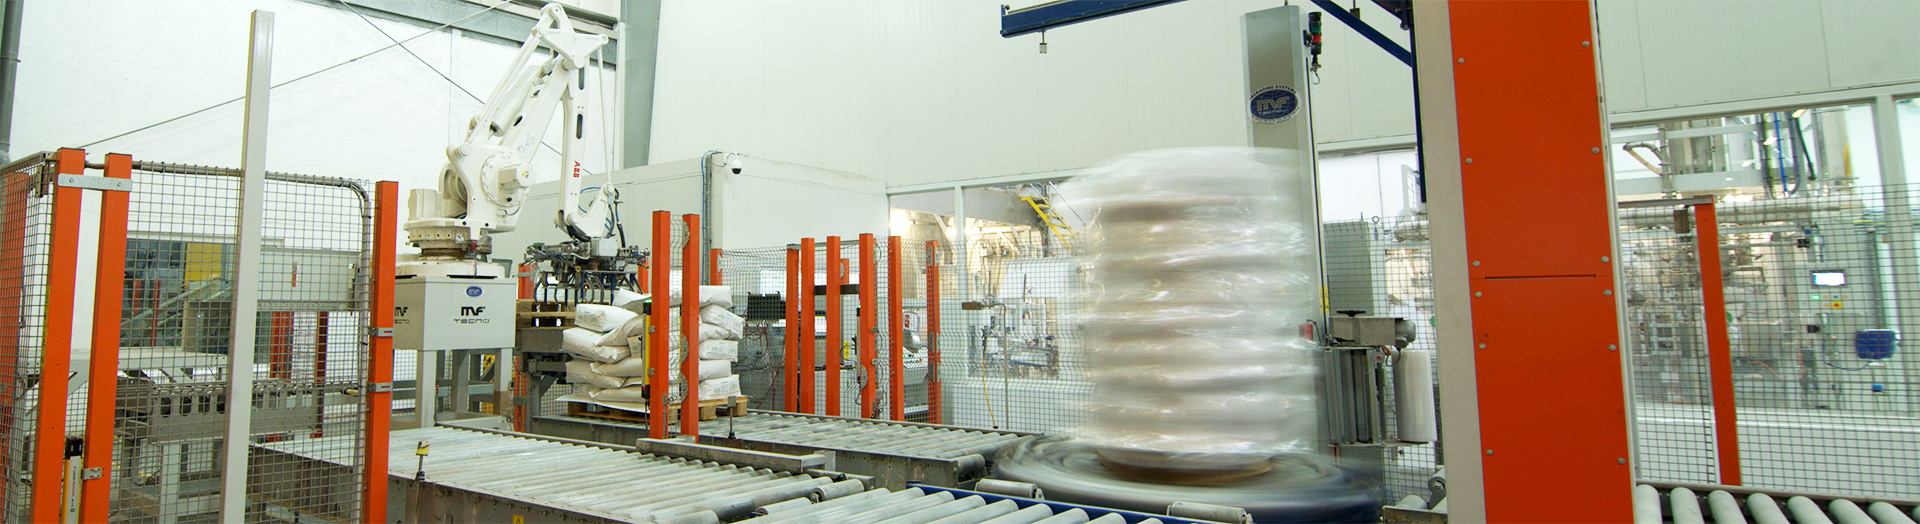 big-slide-dairy-usine.jpg